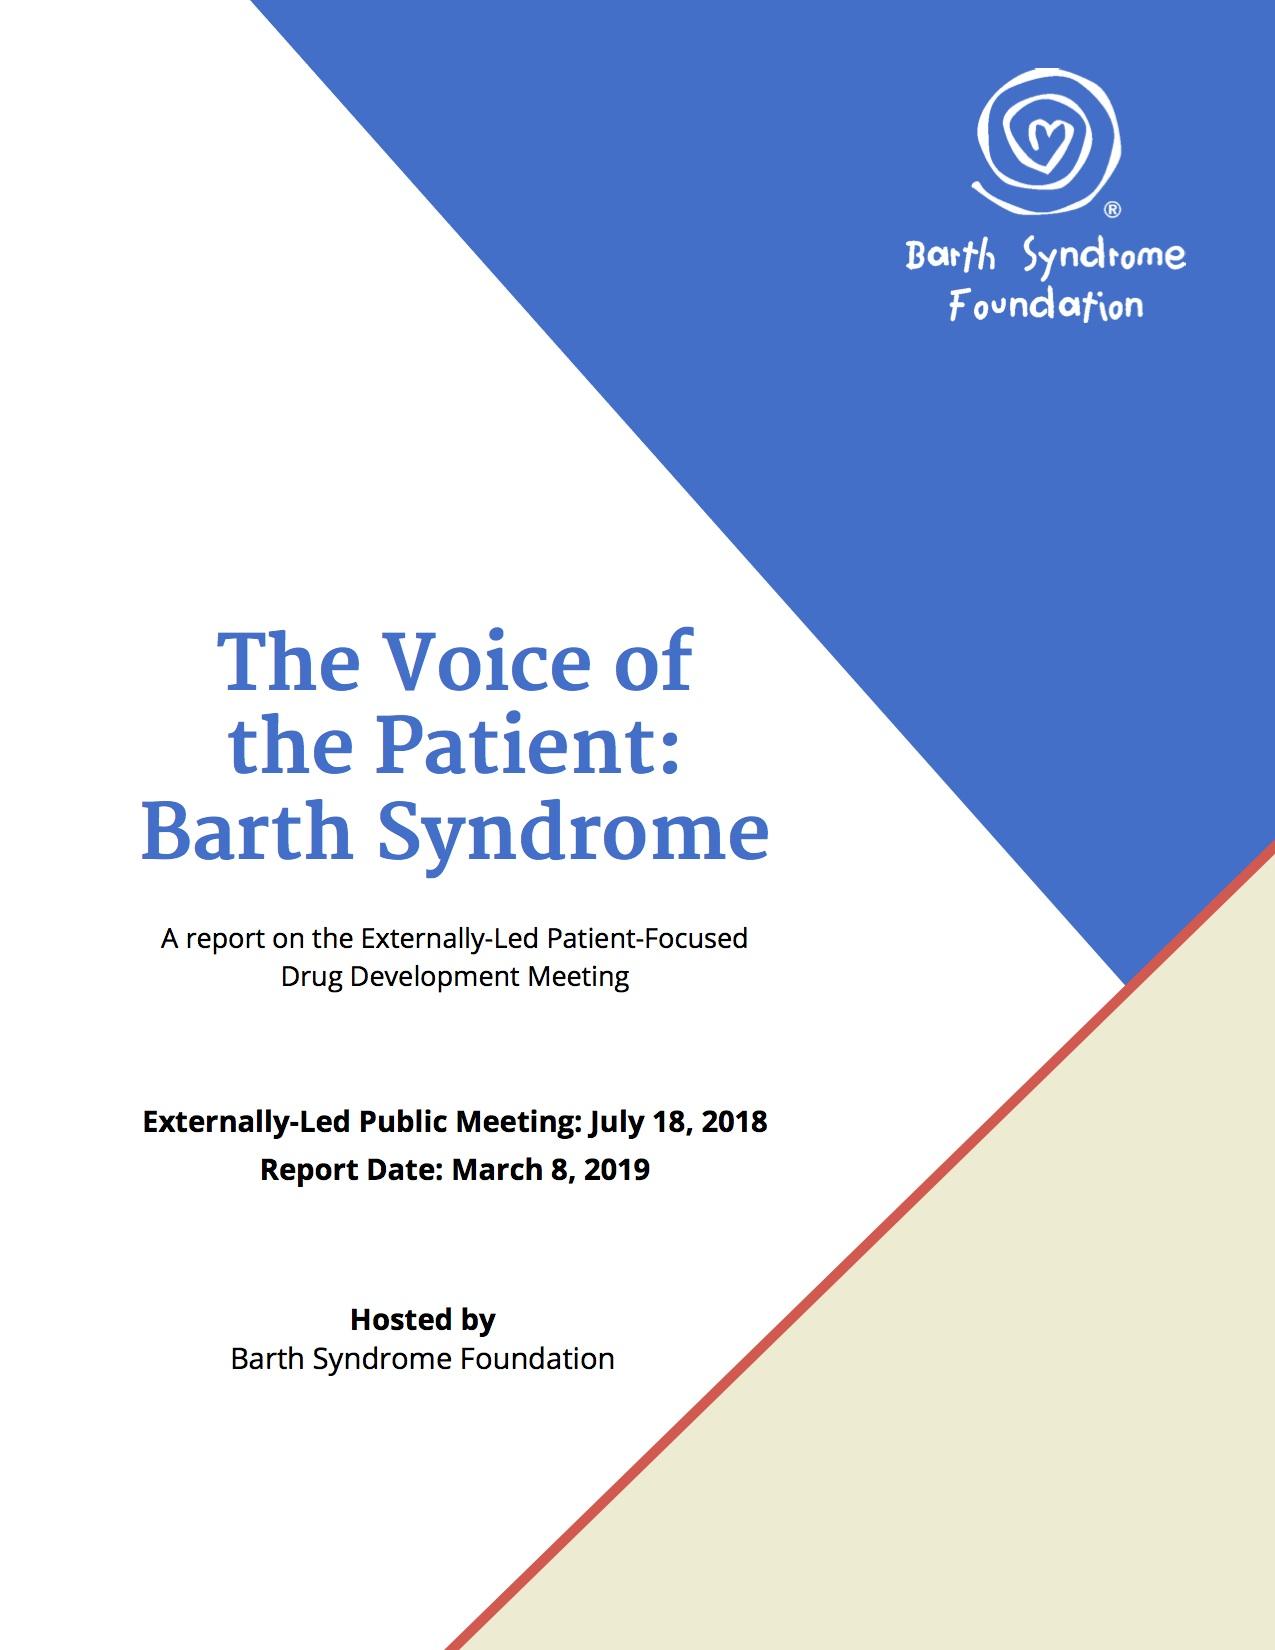 Barth Syndrome Foundation